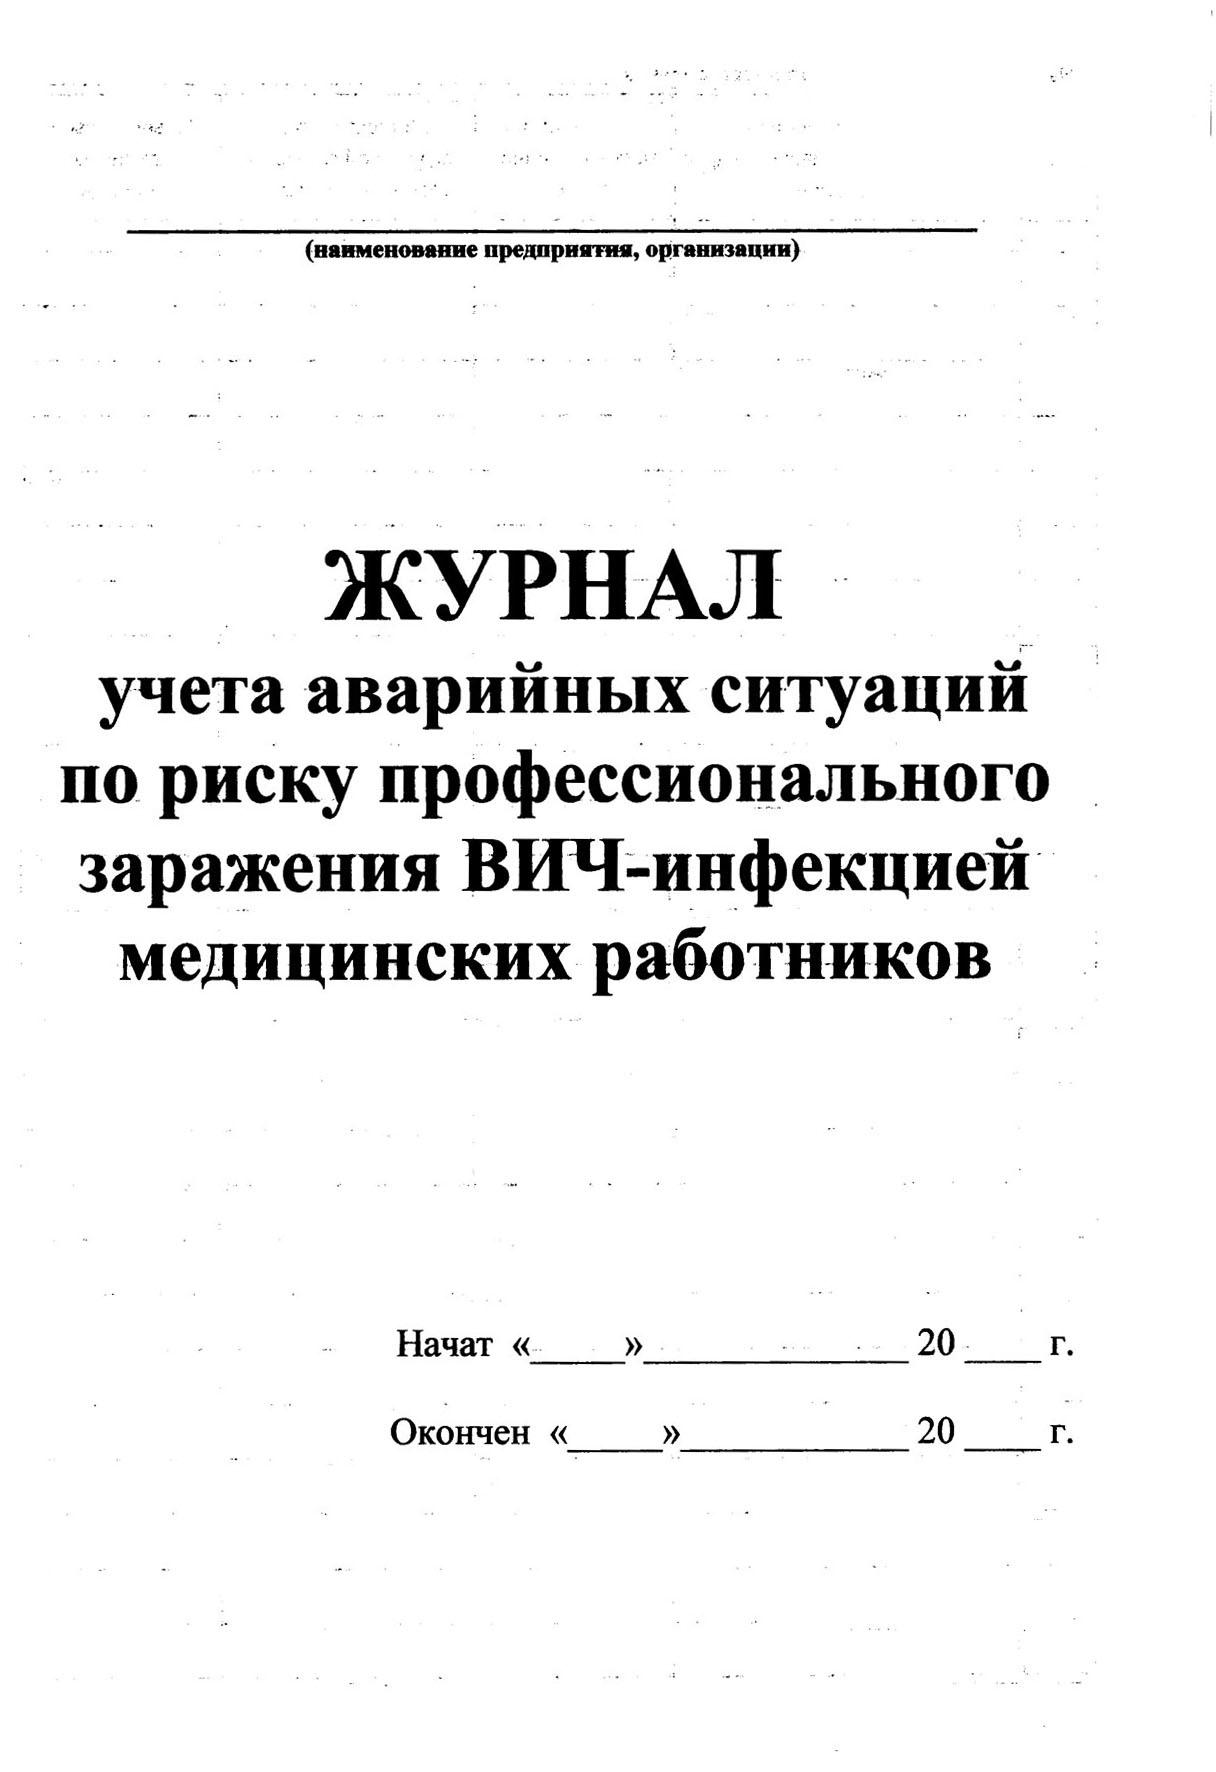 full_4526398fc34772f75d560b25dbf9c44b.jpg